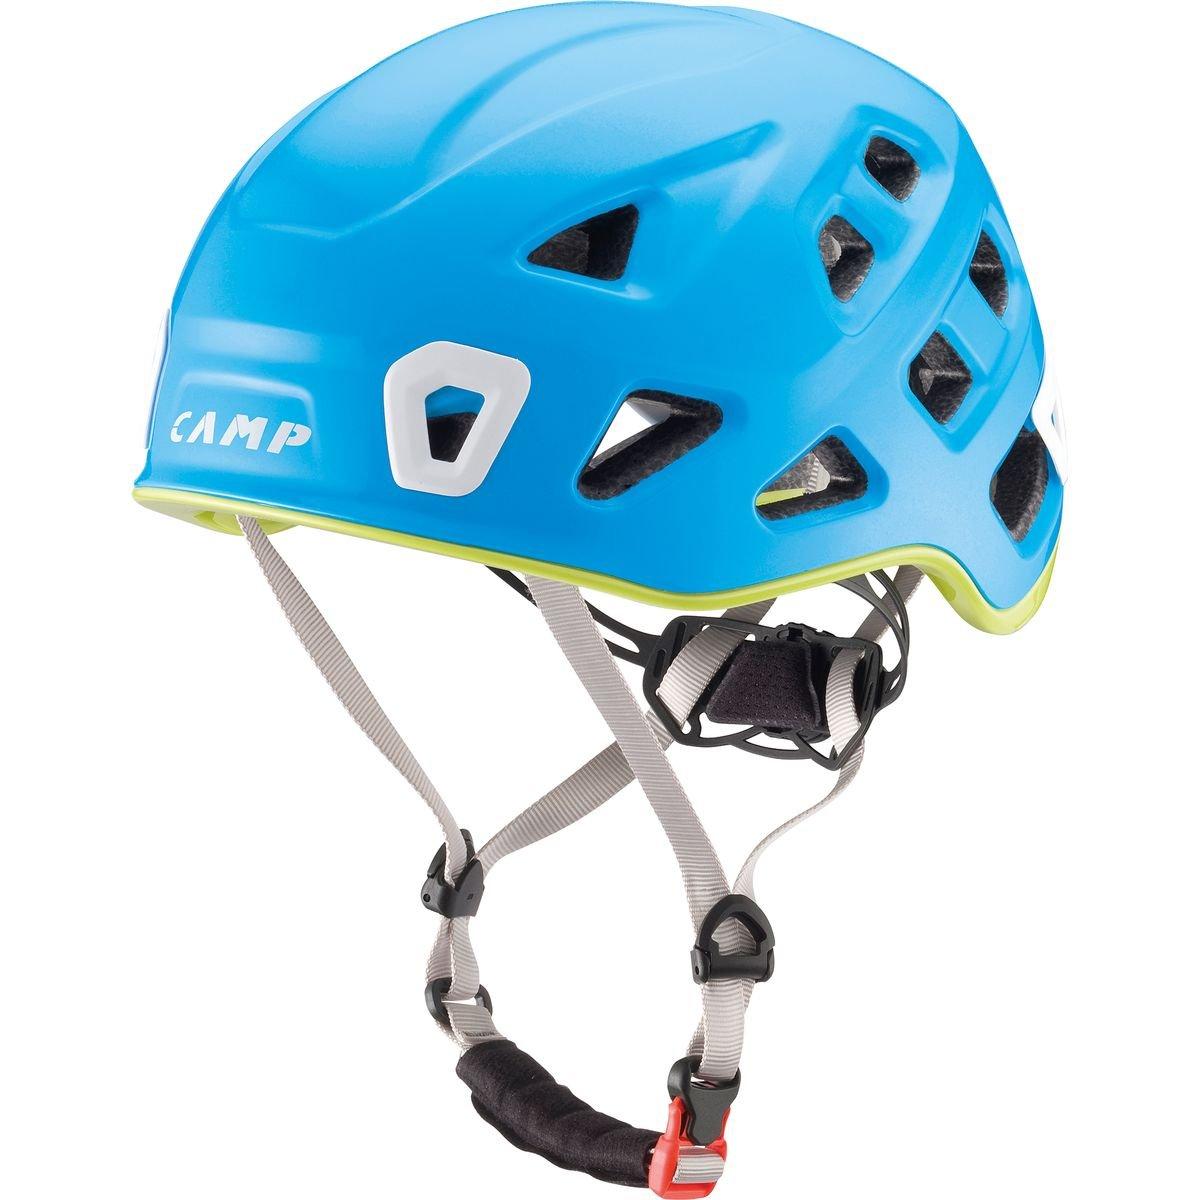 CAMP Storm Helmet - S - Blue